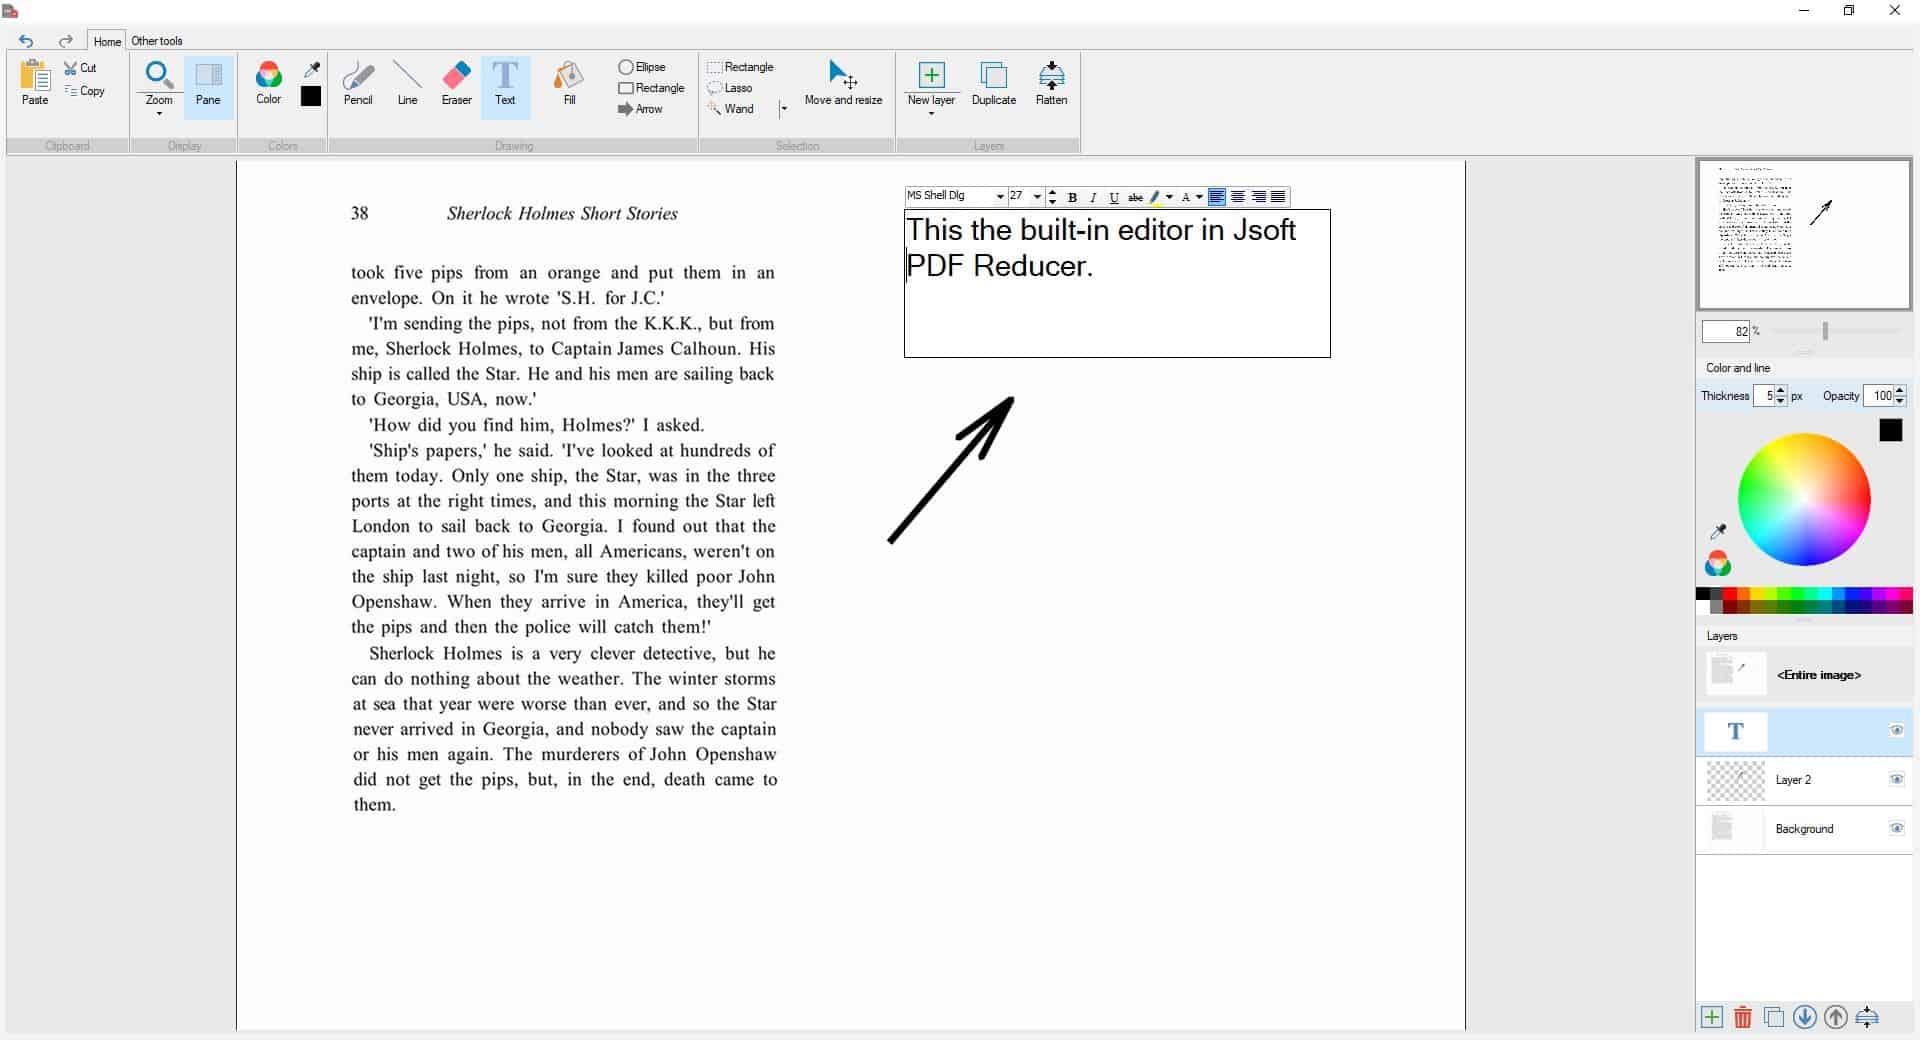 Jsoft PDF Reducer editor